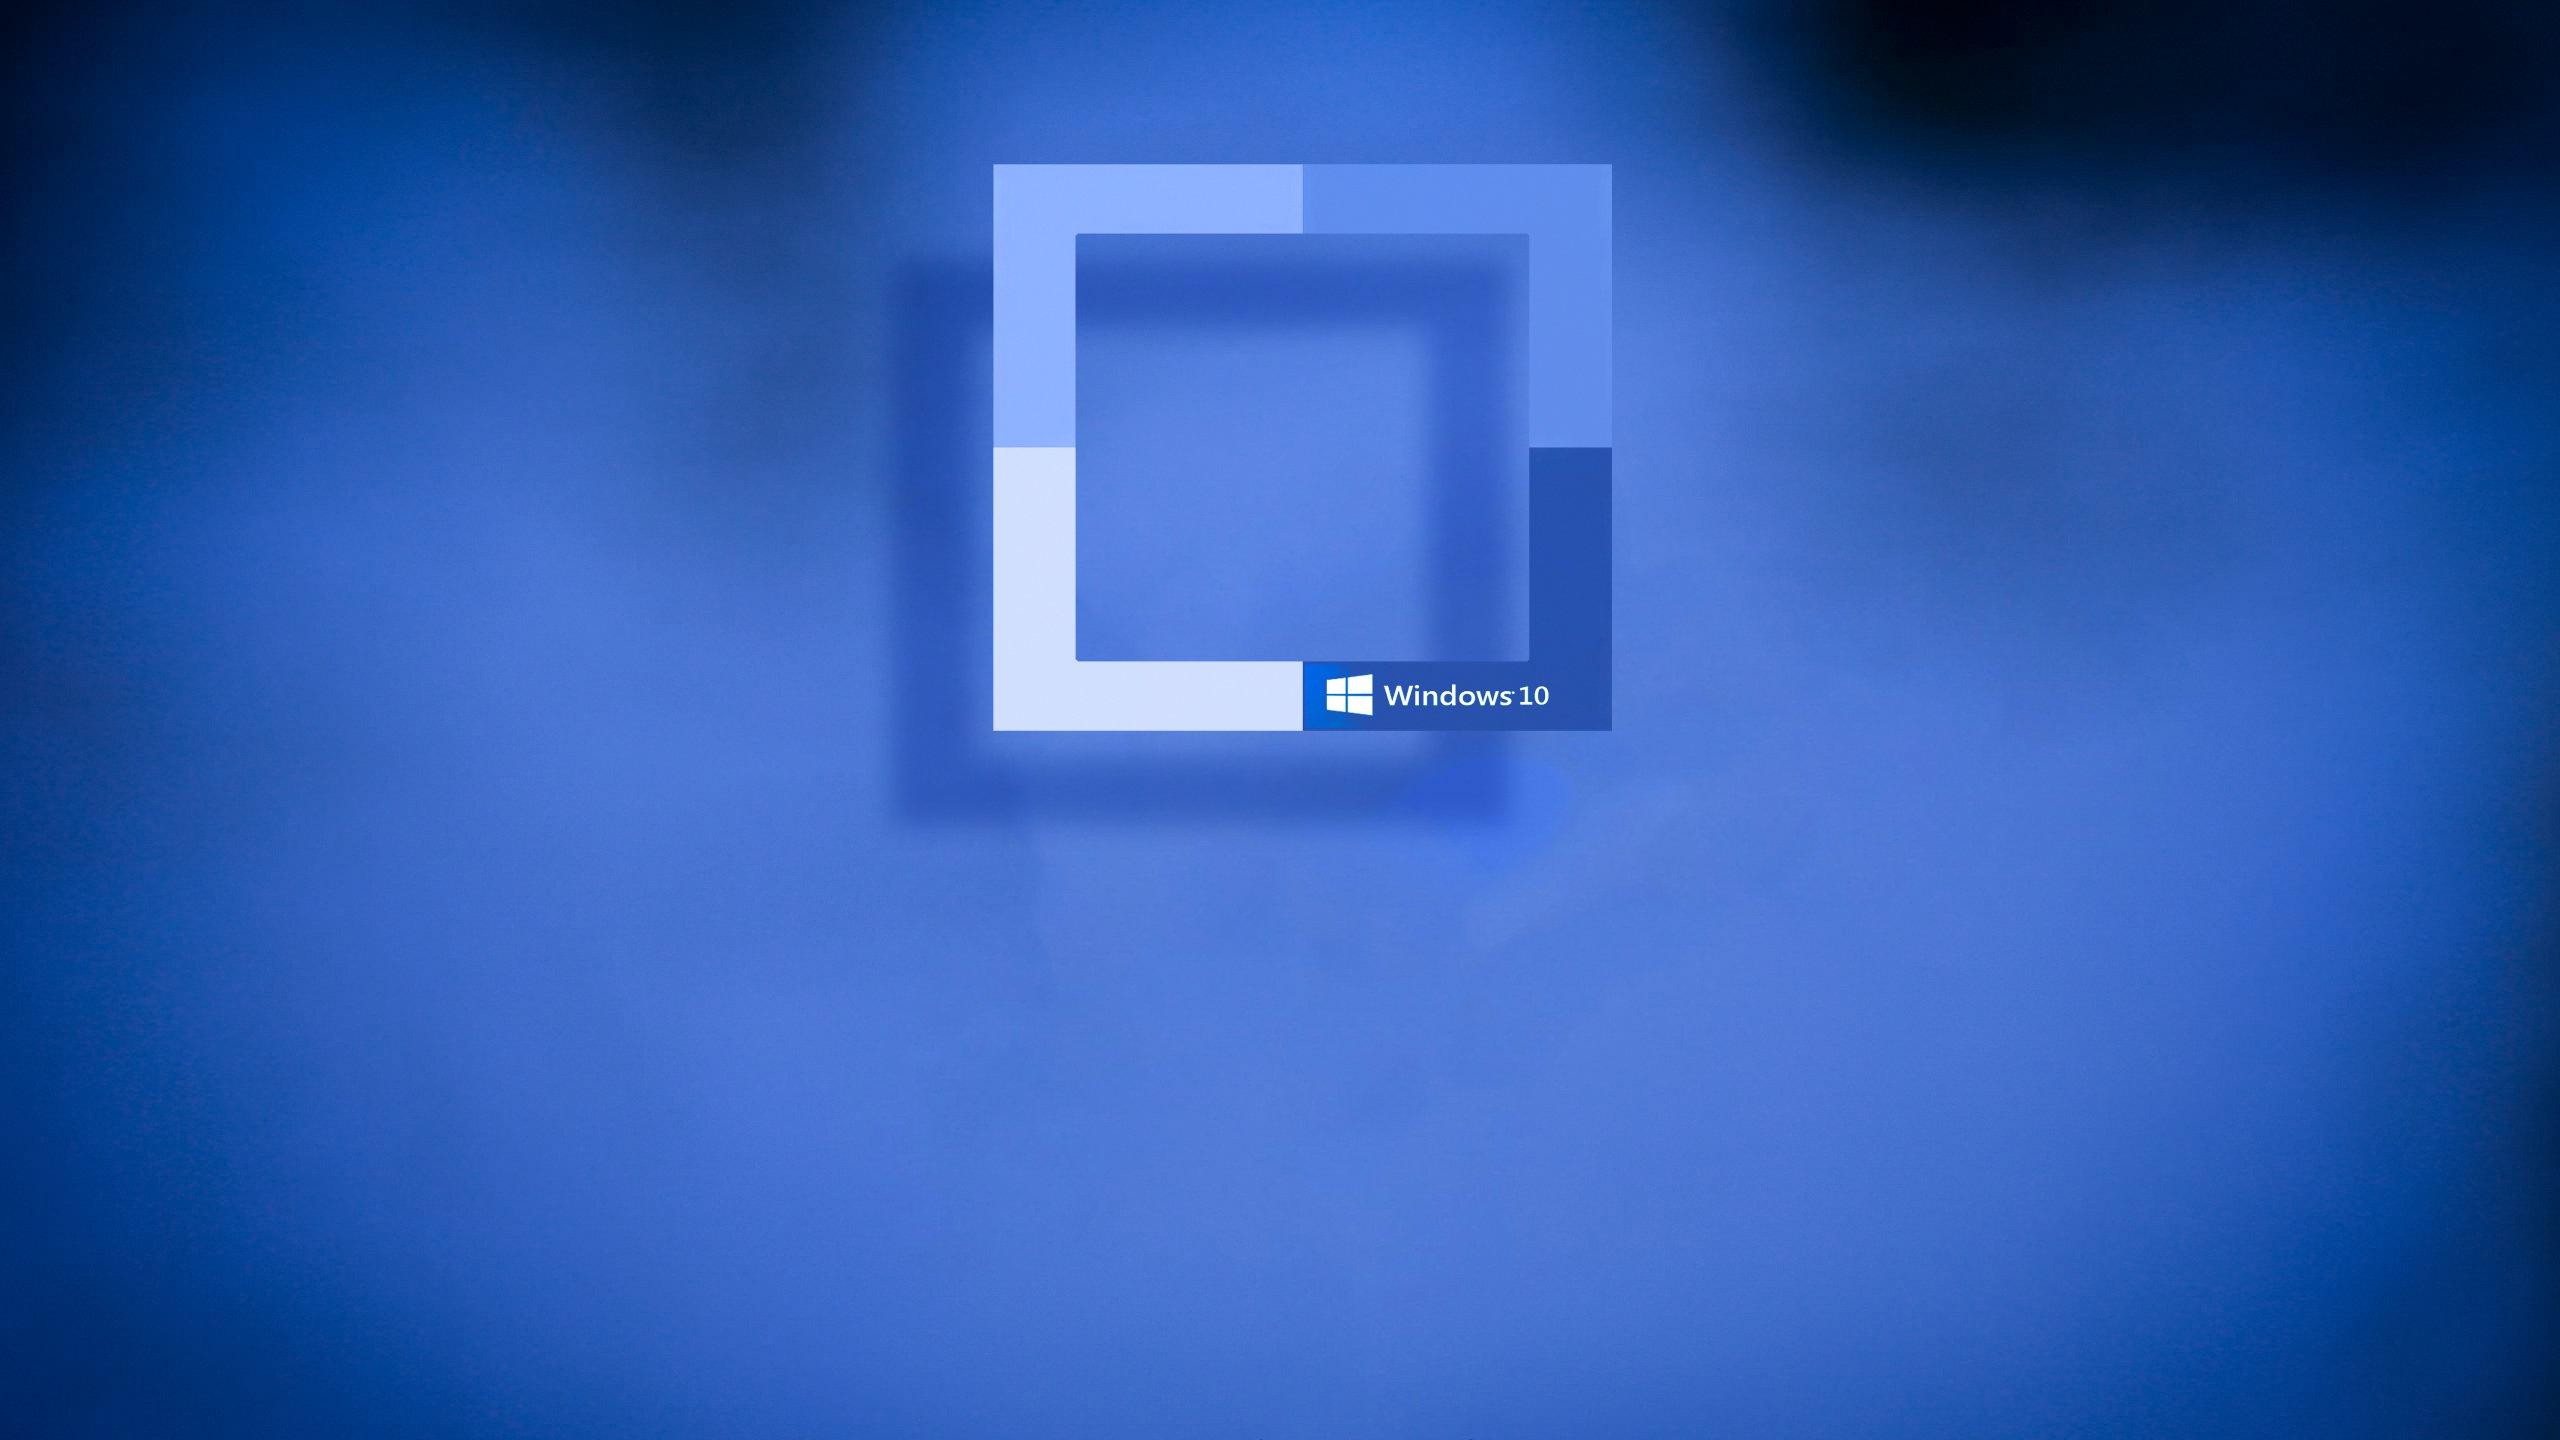 Download Windows 10 Original 4k HD 4k Wallpapers In 2560x1440 ...